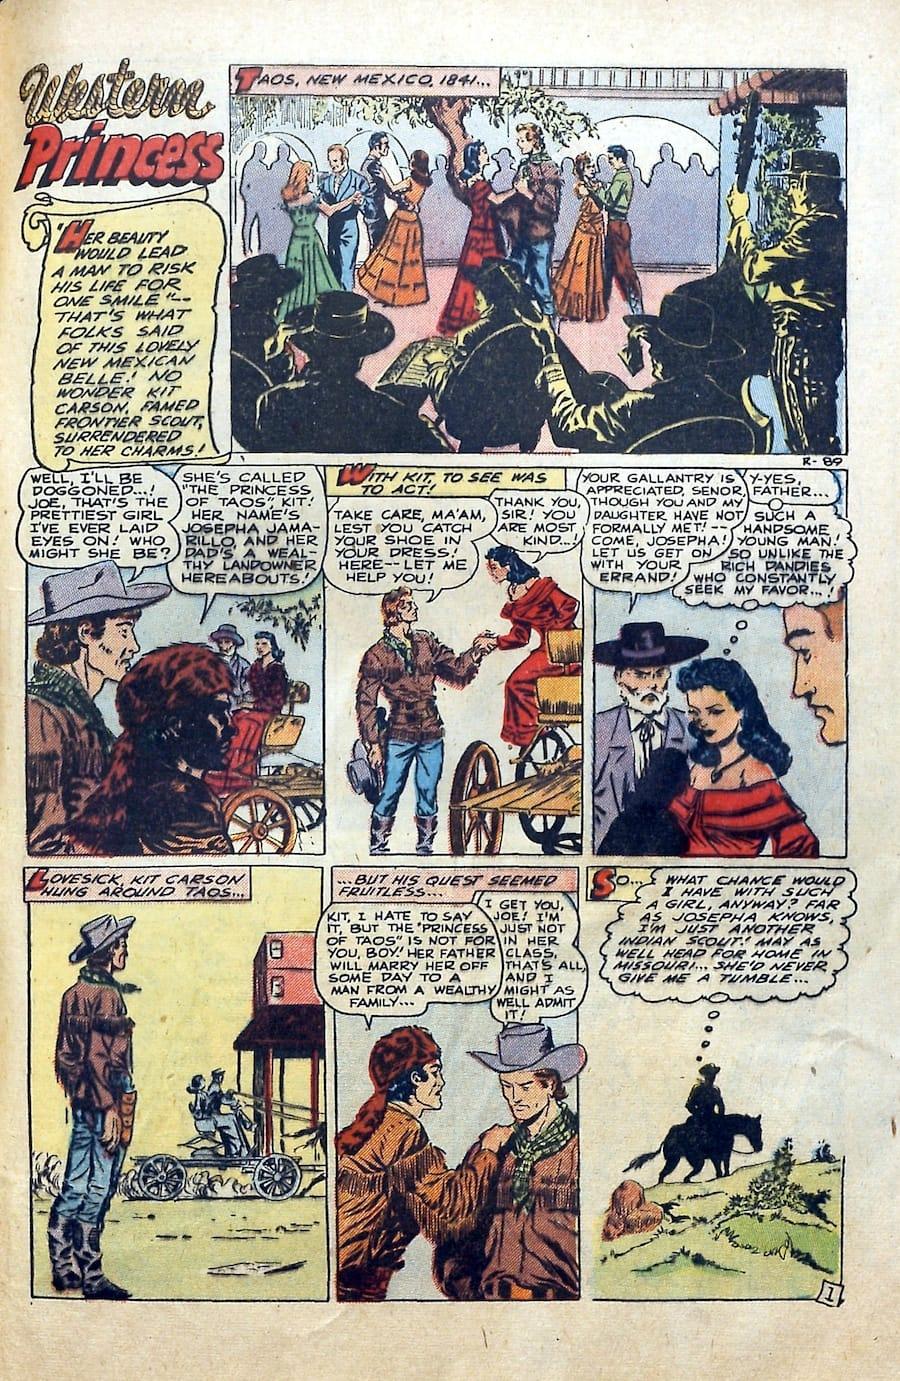 Al Williamson / Frank Frazetta golden age western romance comic book